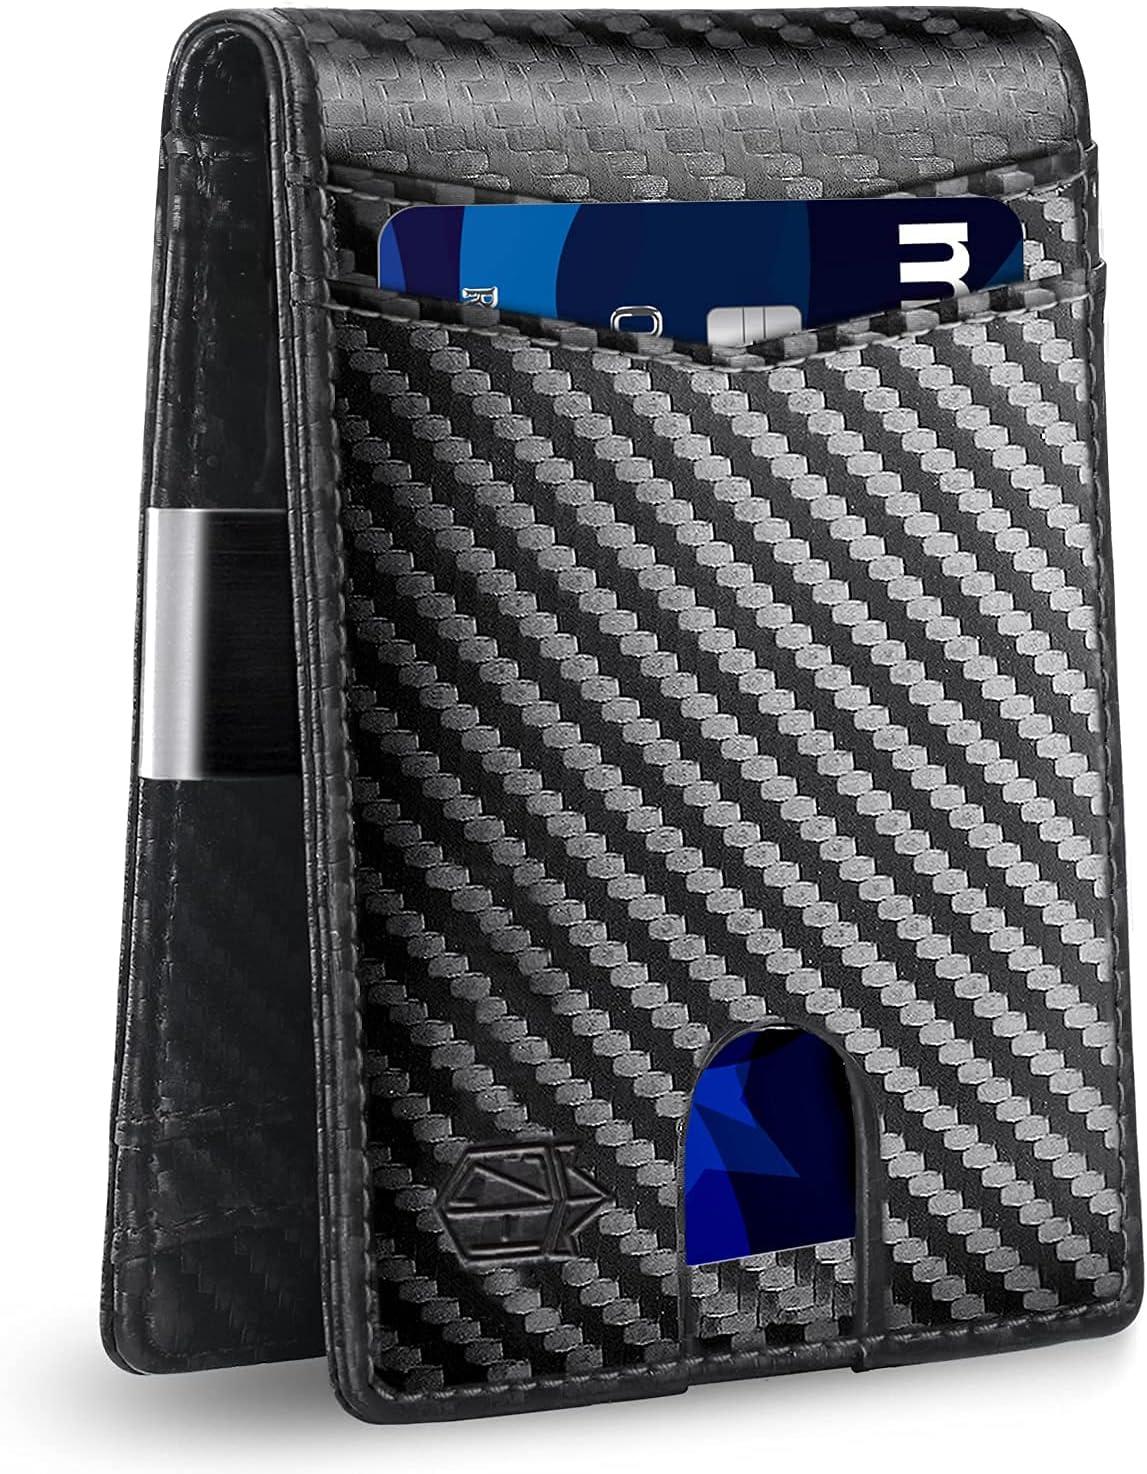 Zitahli Mens Wallet Extra-capacity 12 Slots Money Clip Wallet Slim RFID Blocking Front Pocket Bifold Wallet for Men with ID Window